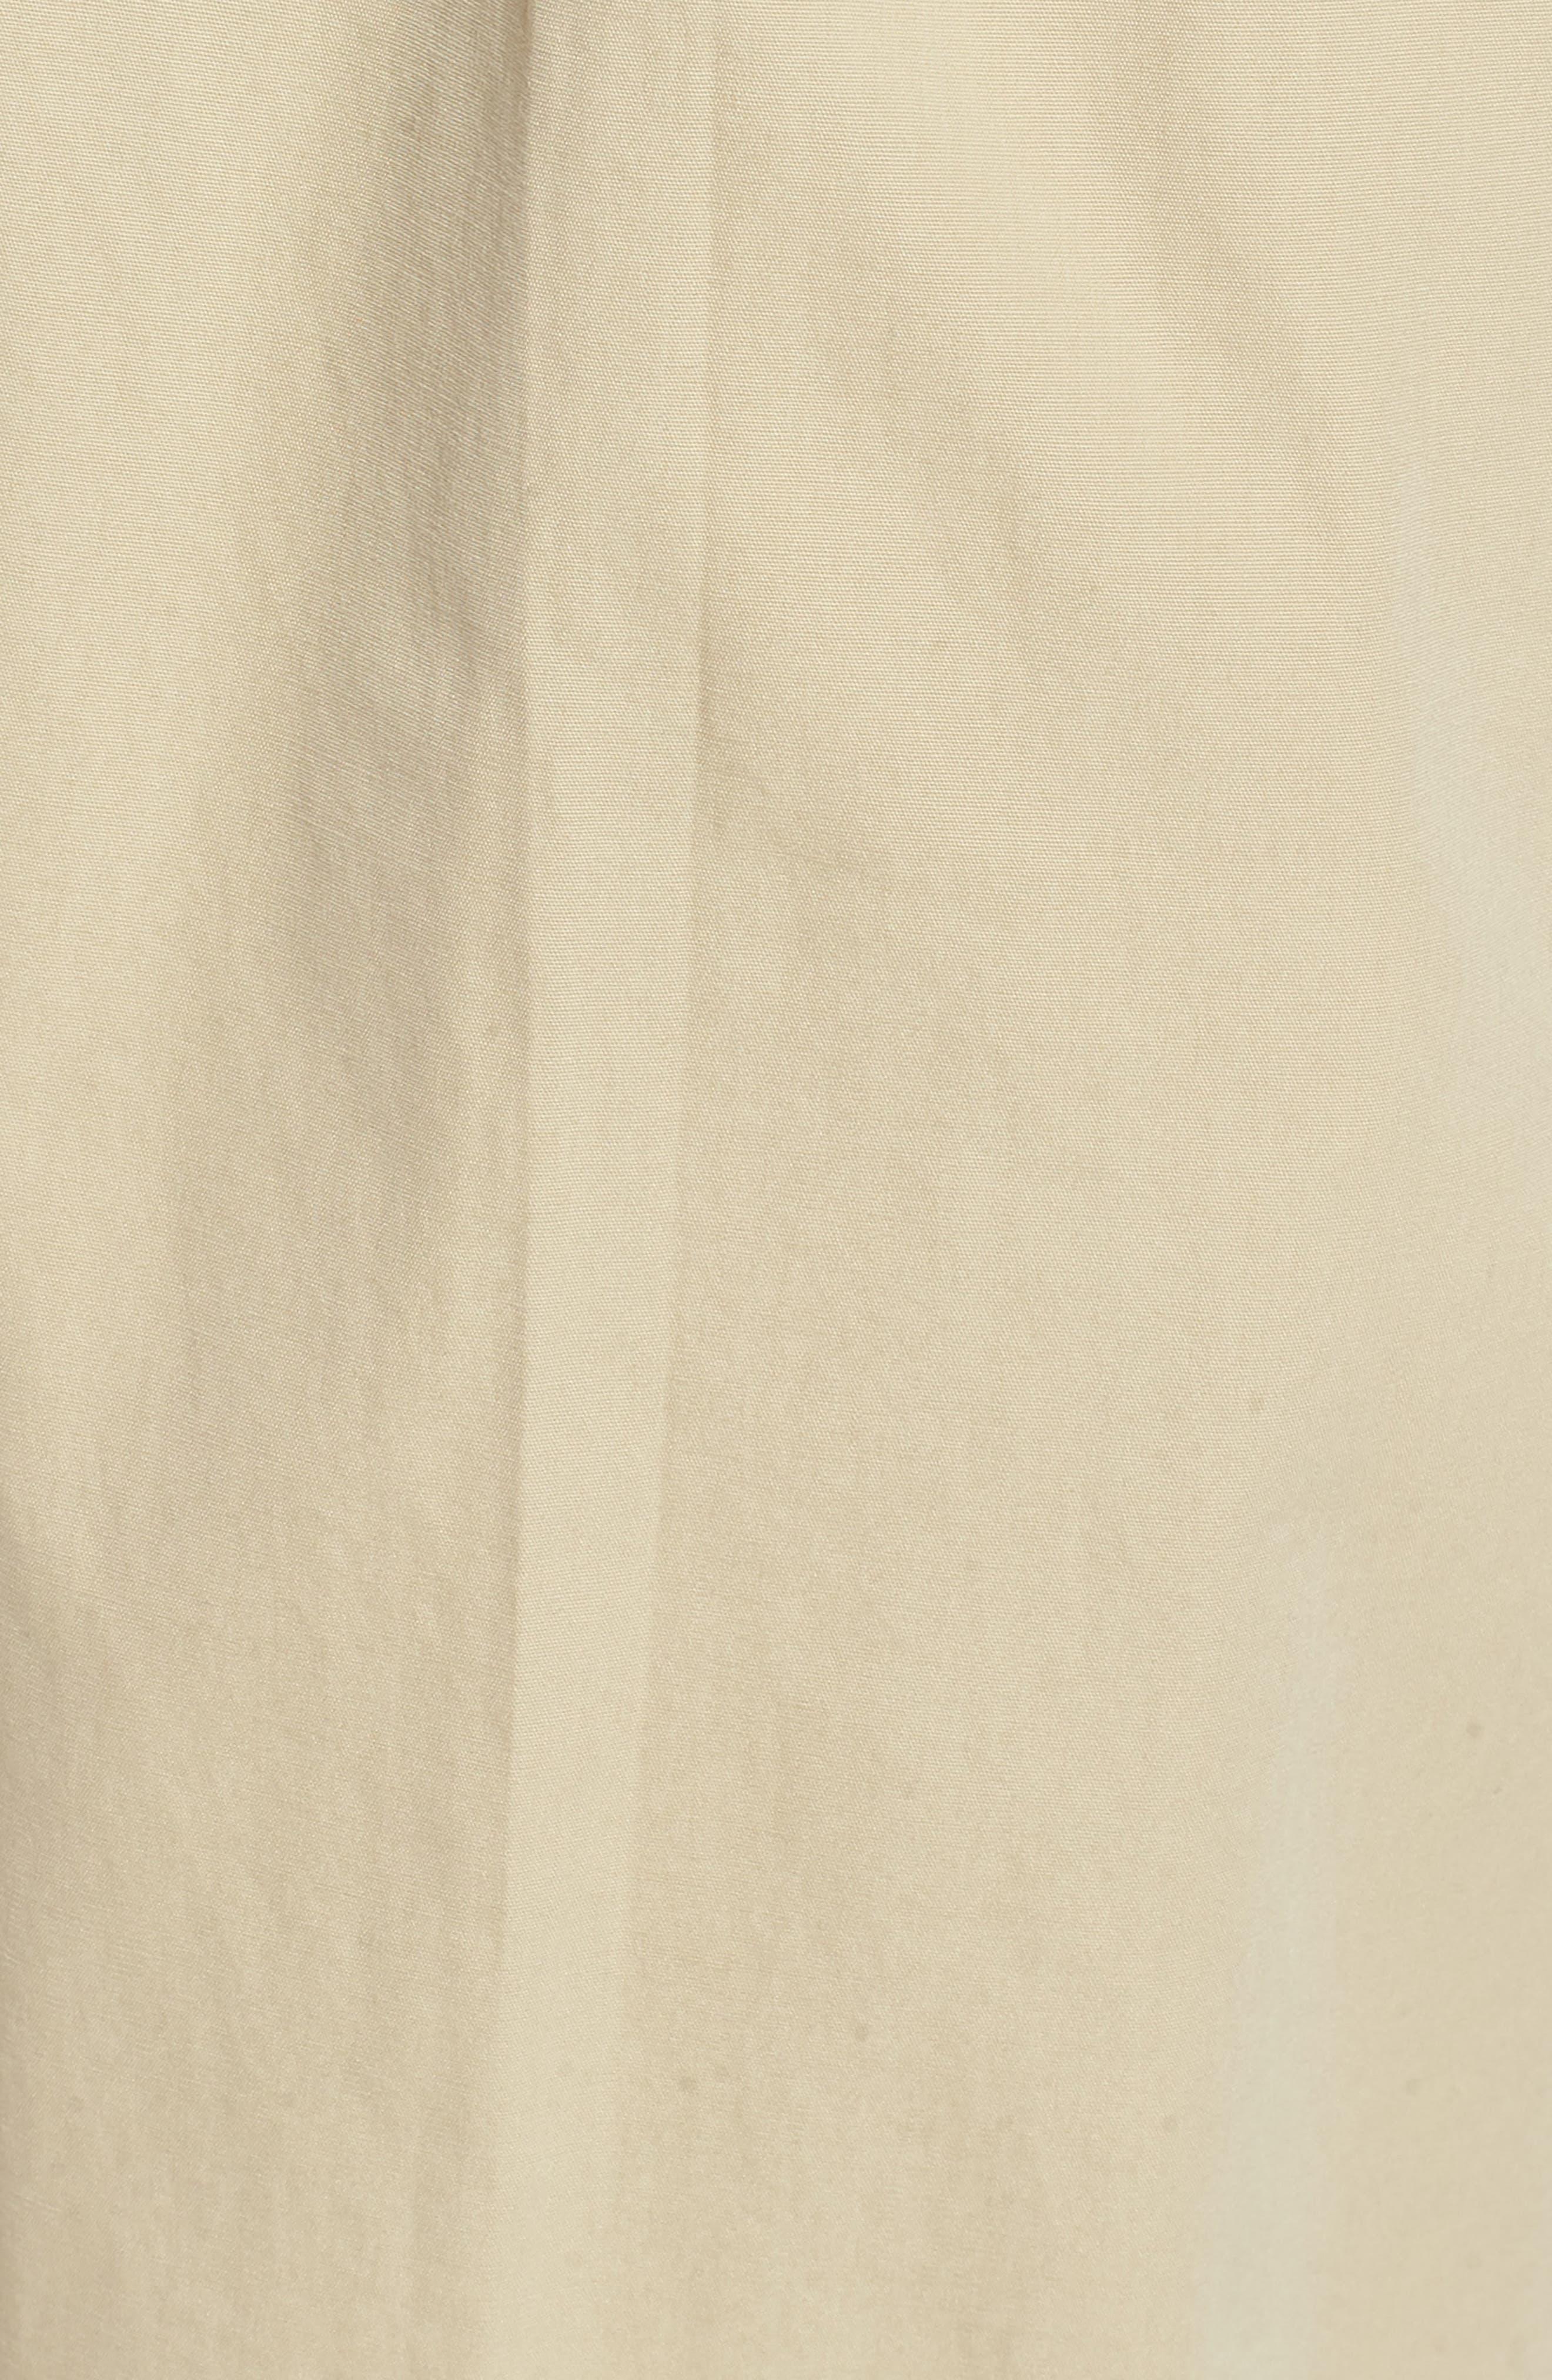 M2 Classic Fit Pleated Tropical Cotton Poplin Pants,                             Alternate thumbnail 5, color,                             Khaki